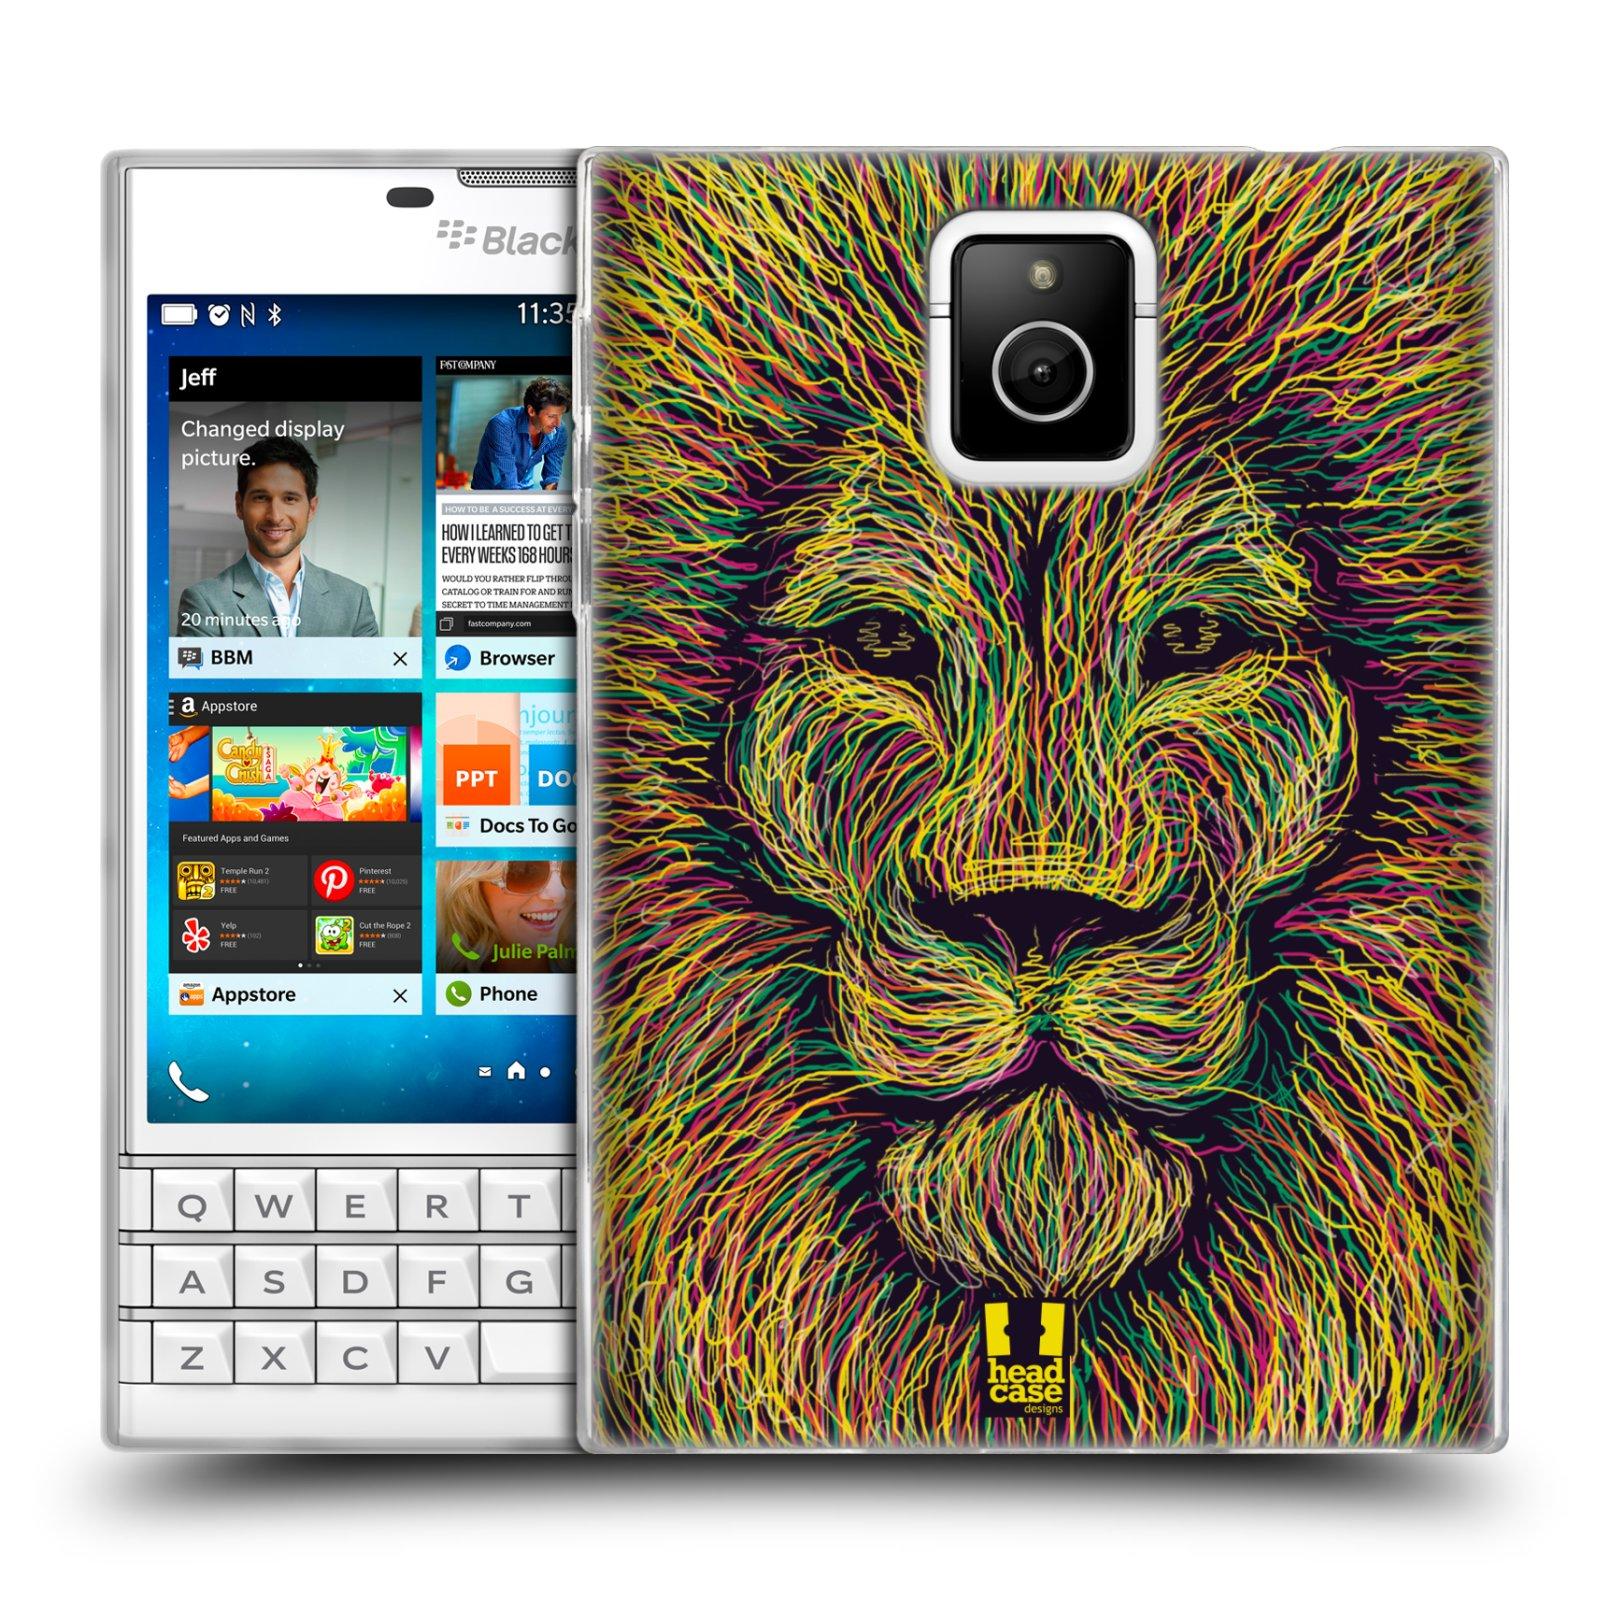 HEAD CASE silikonový obal na mobil Blackberry PASSPORT vzor zvíře čmáranice lev